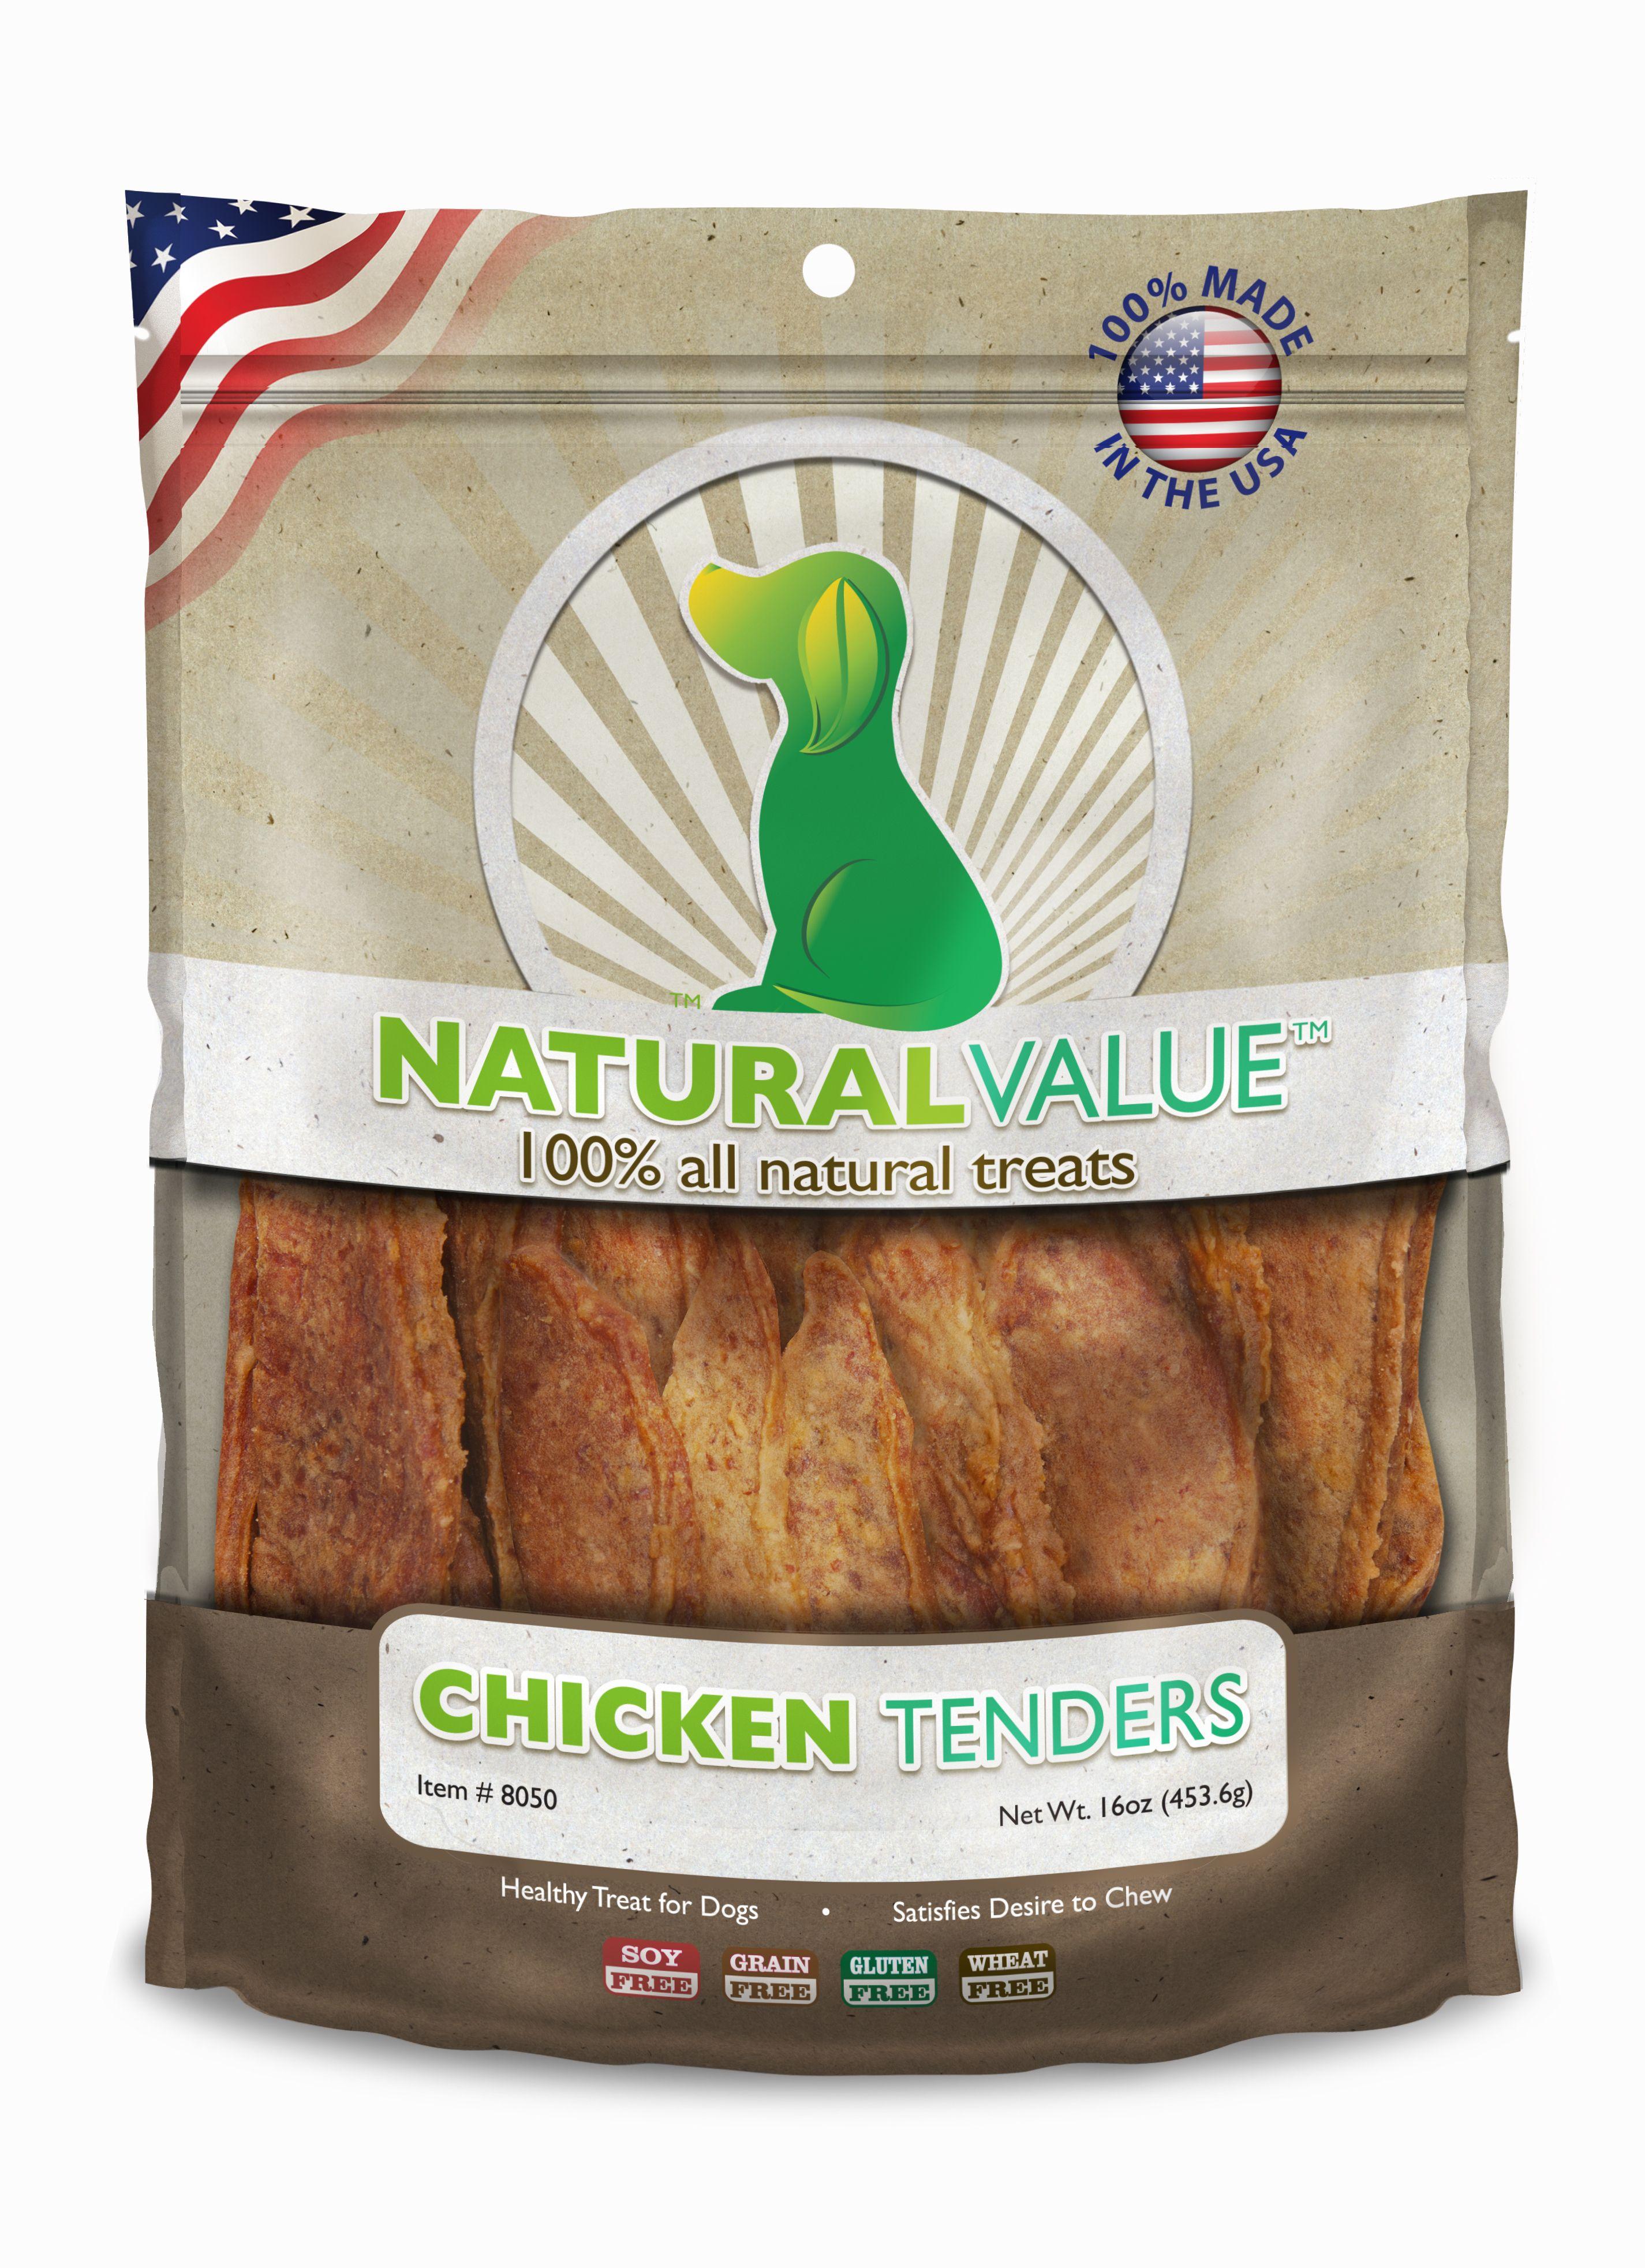 Natural value 100 all natural treatschicken tenders by